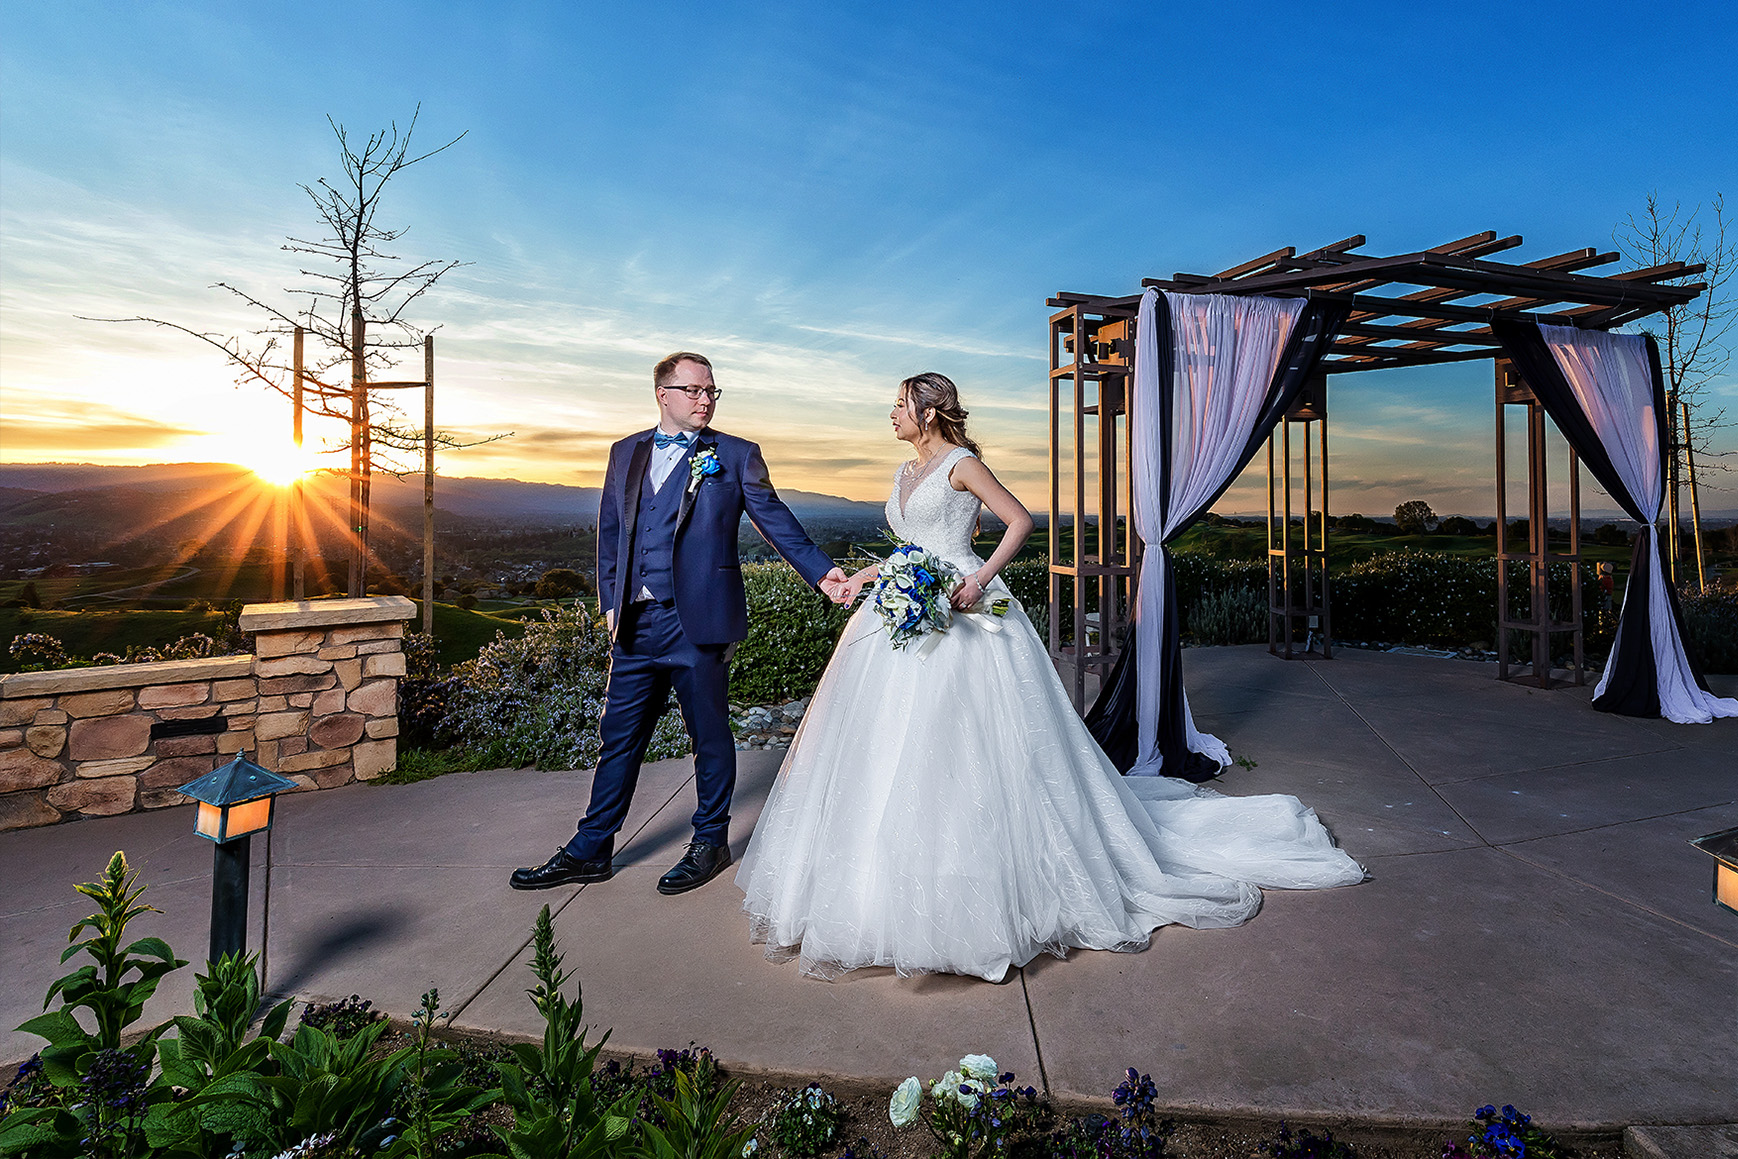 Dramatic Couple  - Boulder Ridge - Los Gatos, California - San Jose, California - Santa Clara County - Wedgewood Weddings